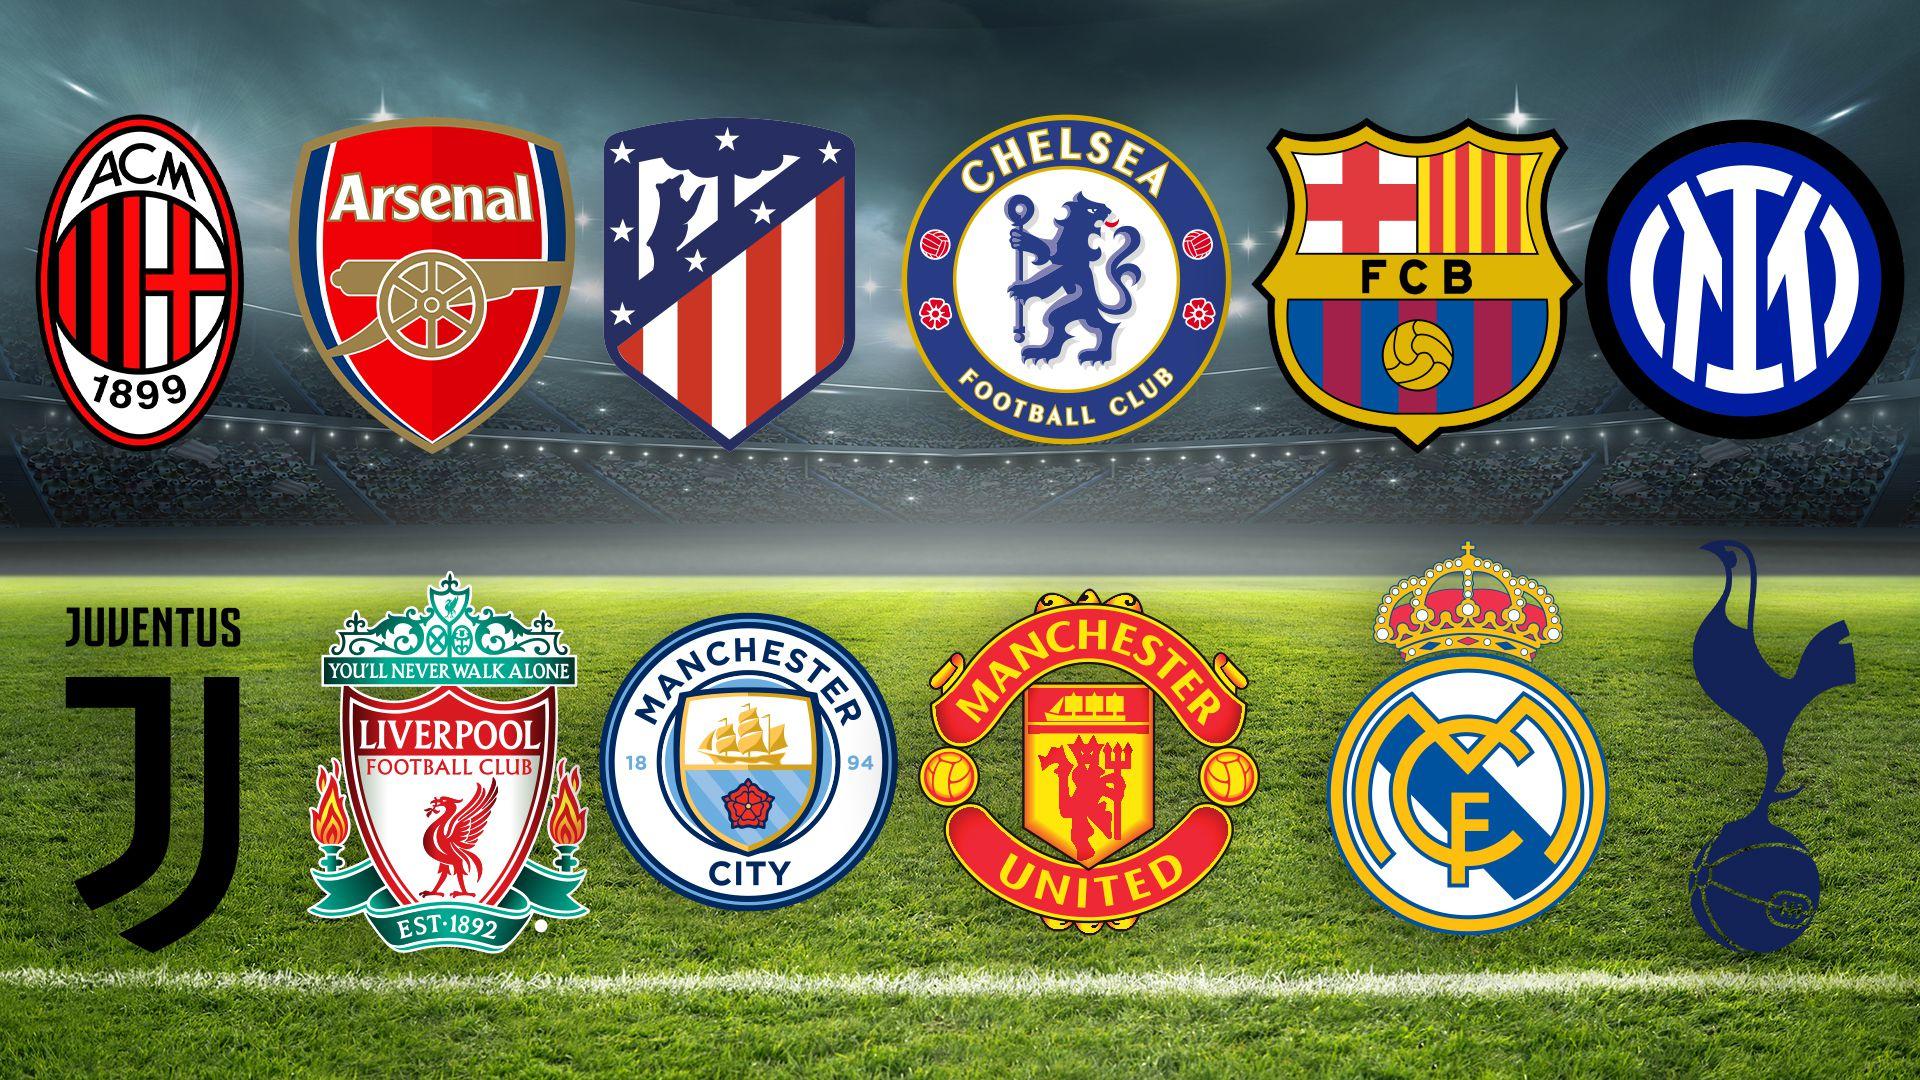 Milan, Arsenal FC, Atlético de Madrid, Chelsea, FC Barcelona, Inter de Milan, Juventus FC, Liverpool FC, Manchester City, Manchester United, Real Madrid CF y Tottenham Hotspur